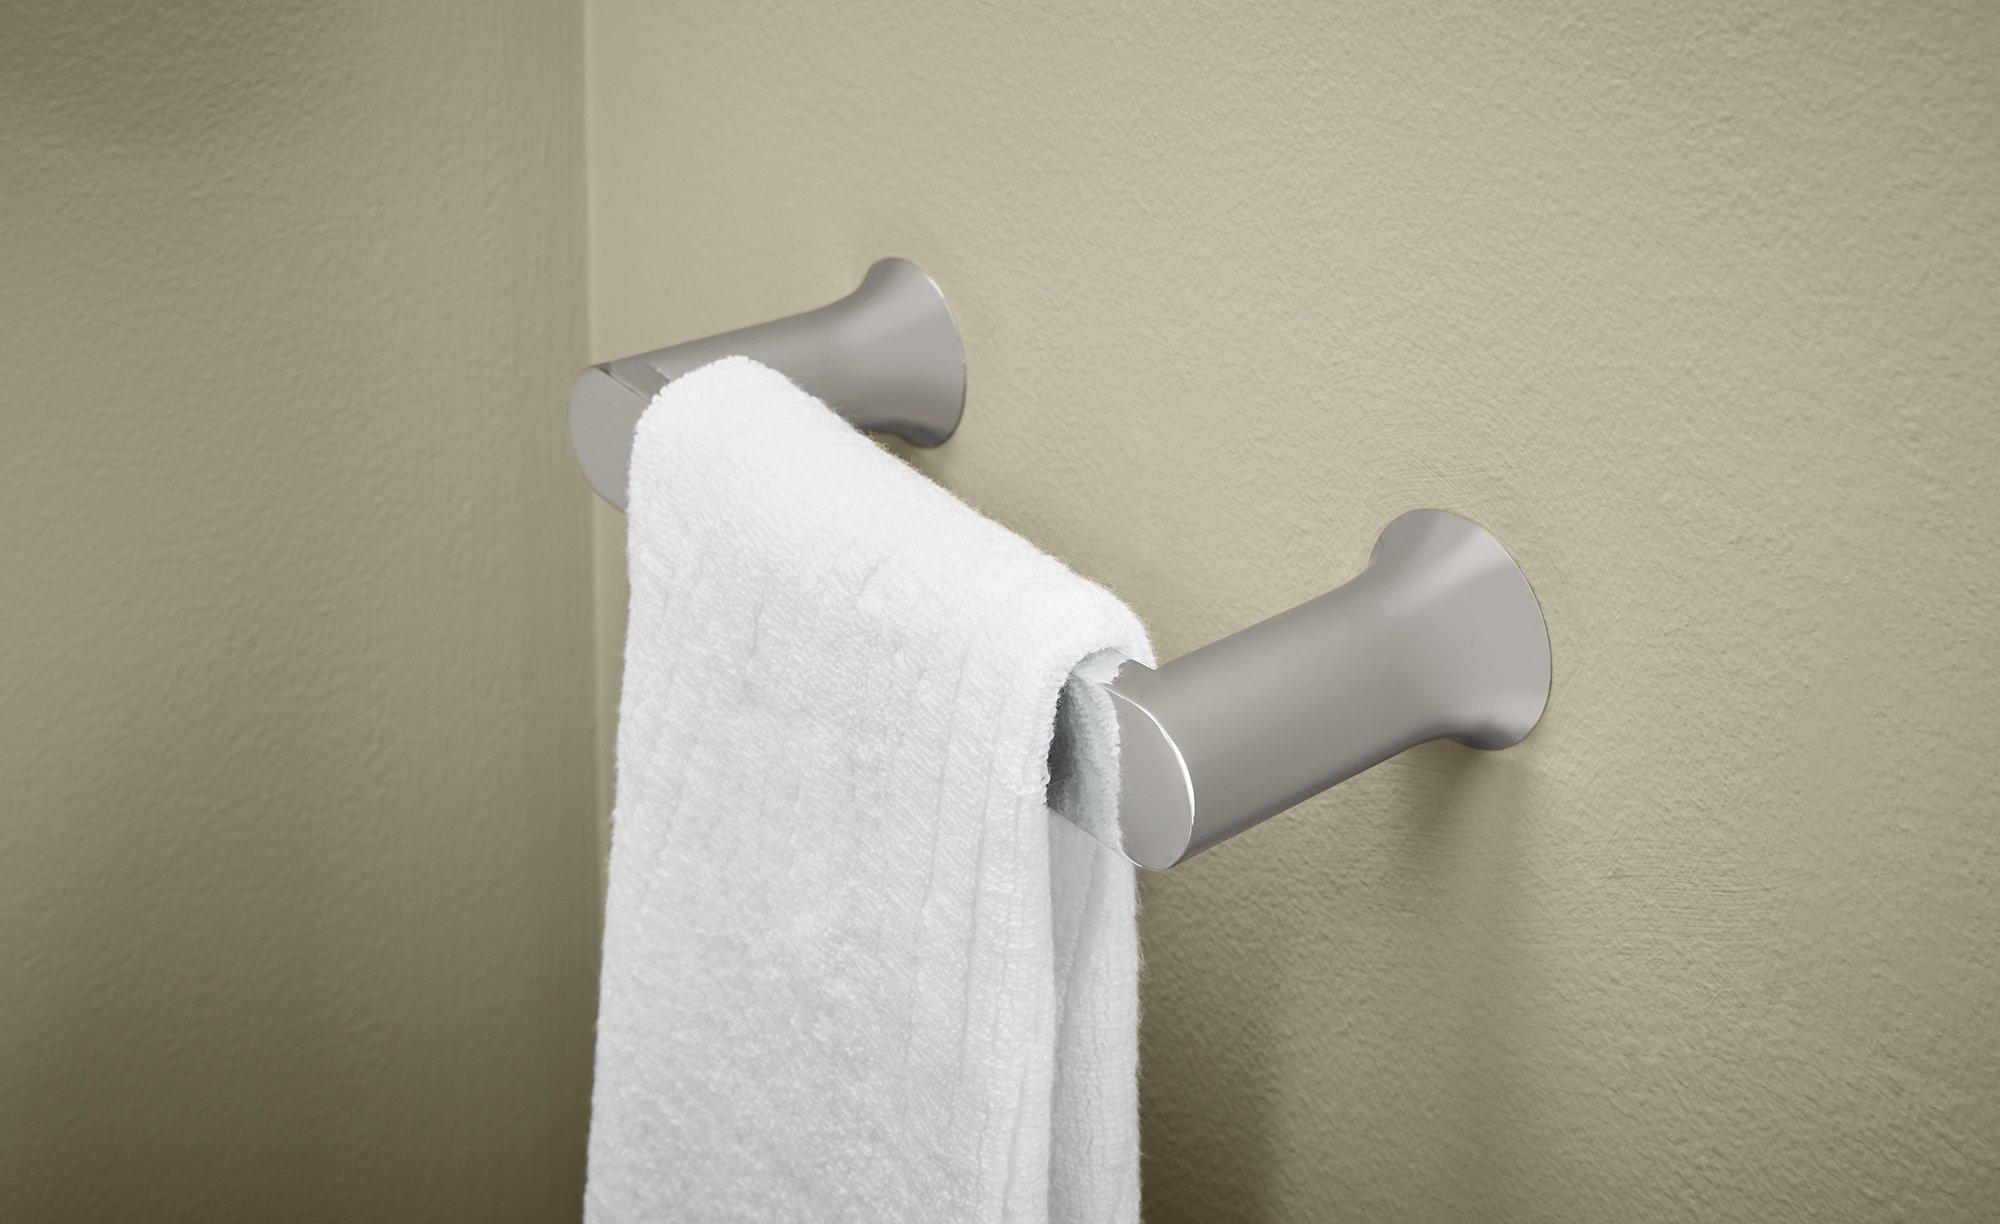 Moen BH3886CH Genta Towel Ring, Chrome by Moen (Image #2)